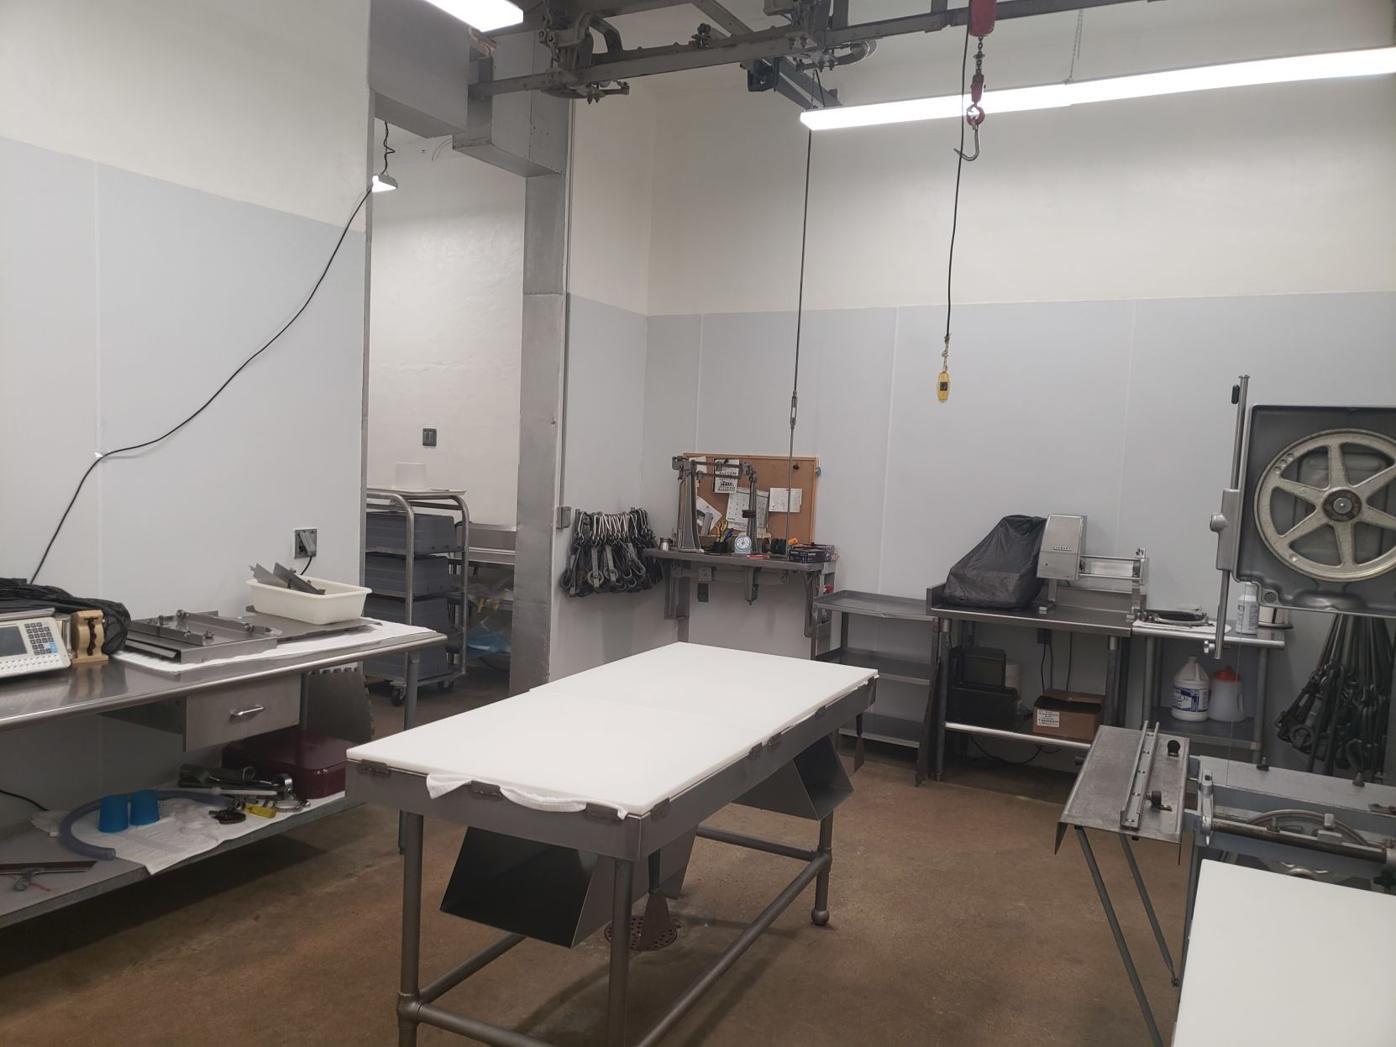 Butchery operating room